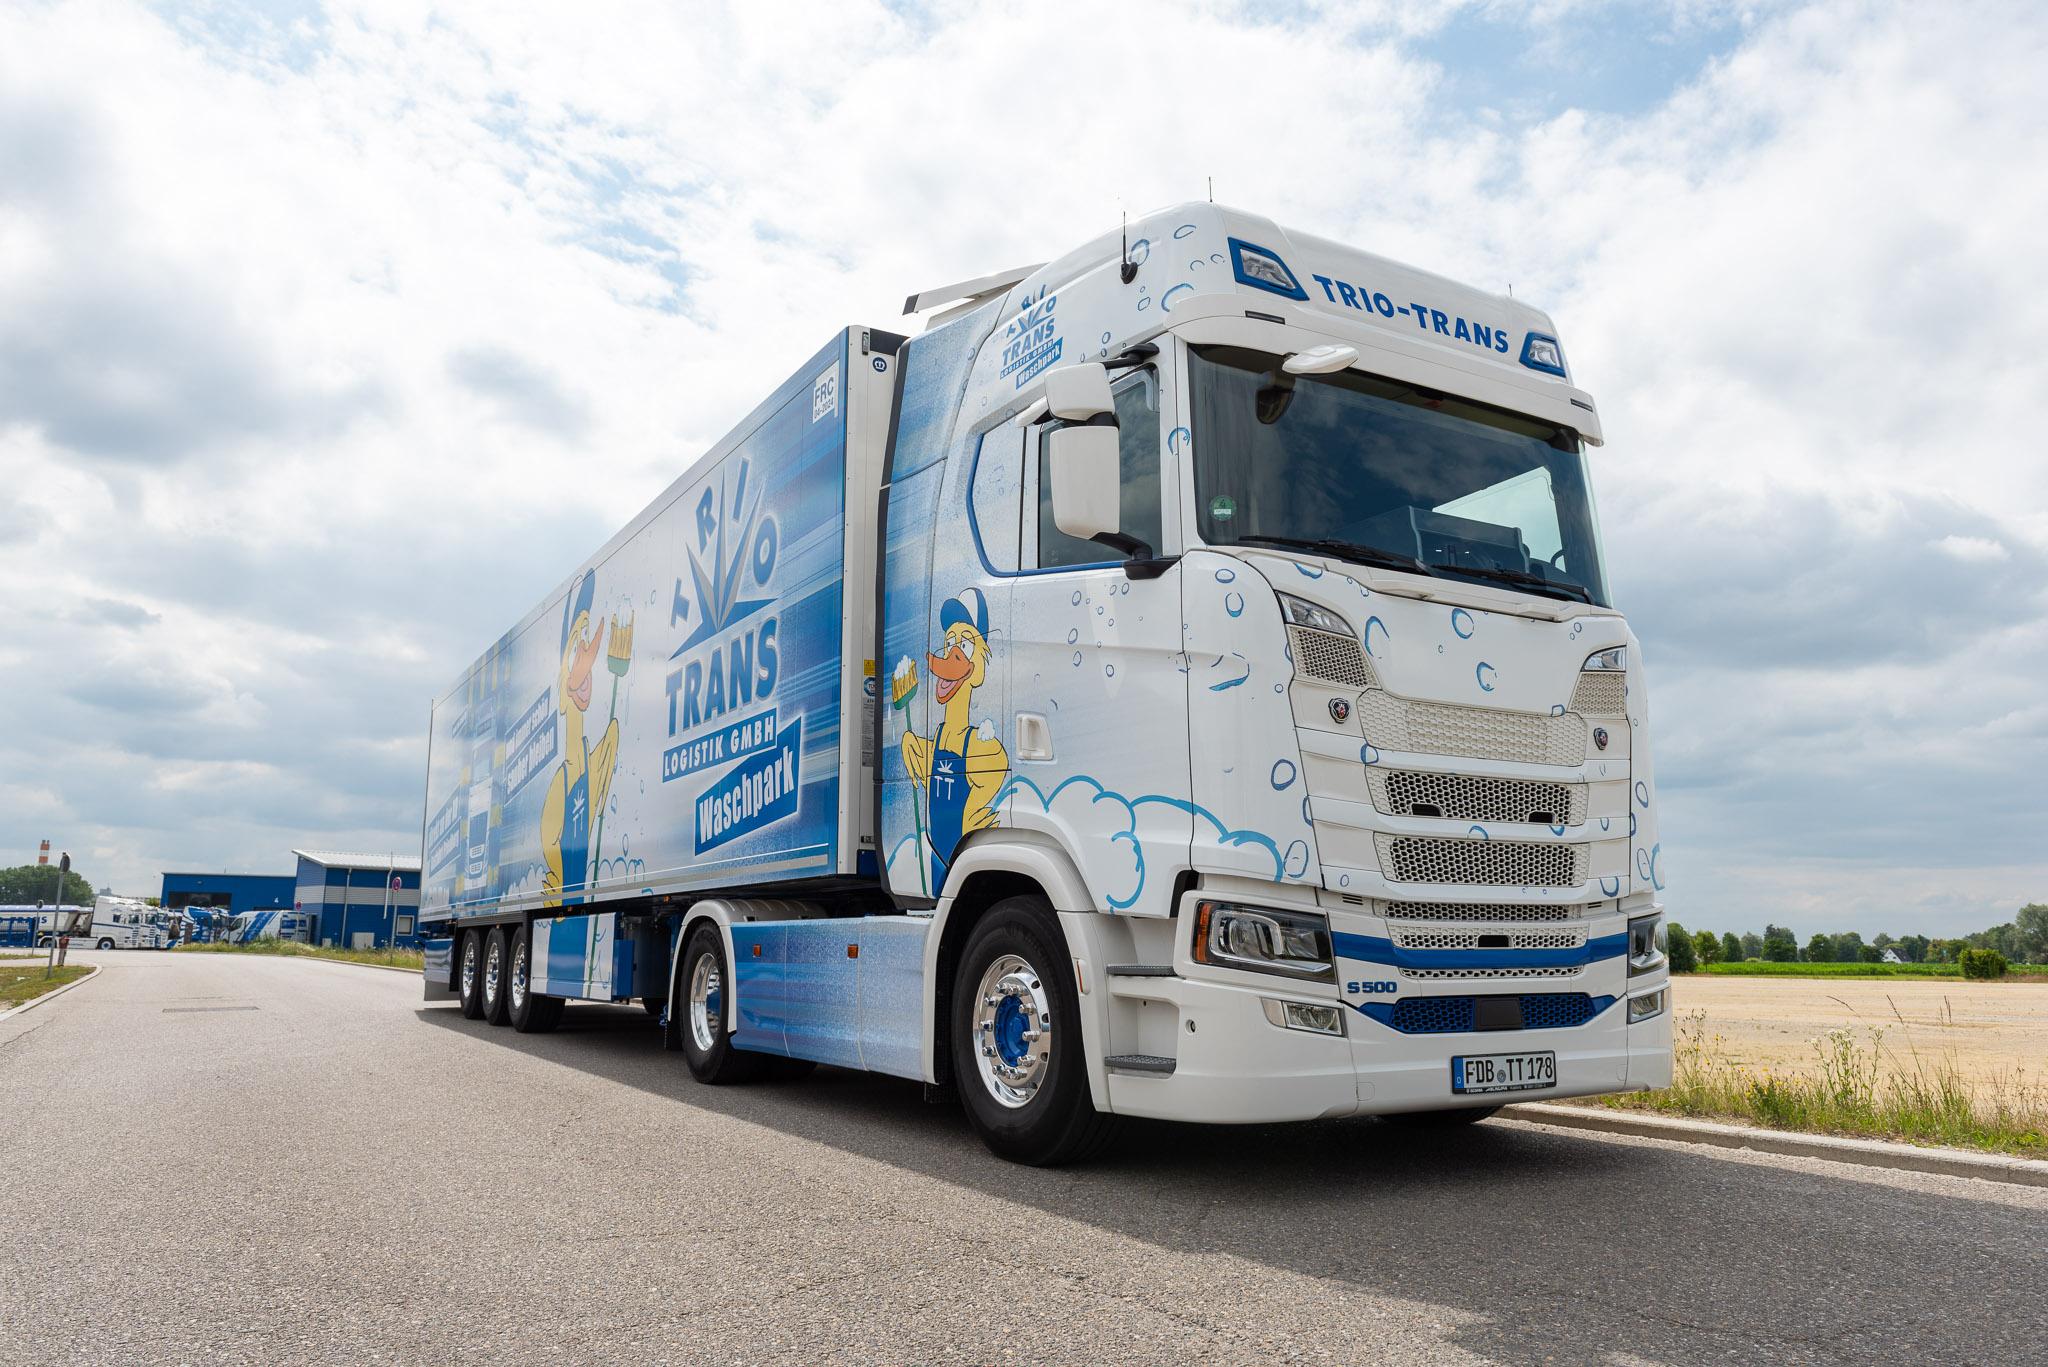 180624-Trio Trans Logistik Trucks-1622-2048.jpg